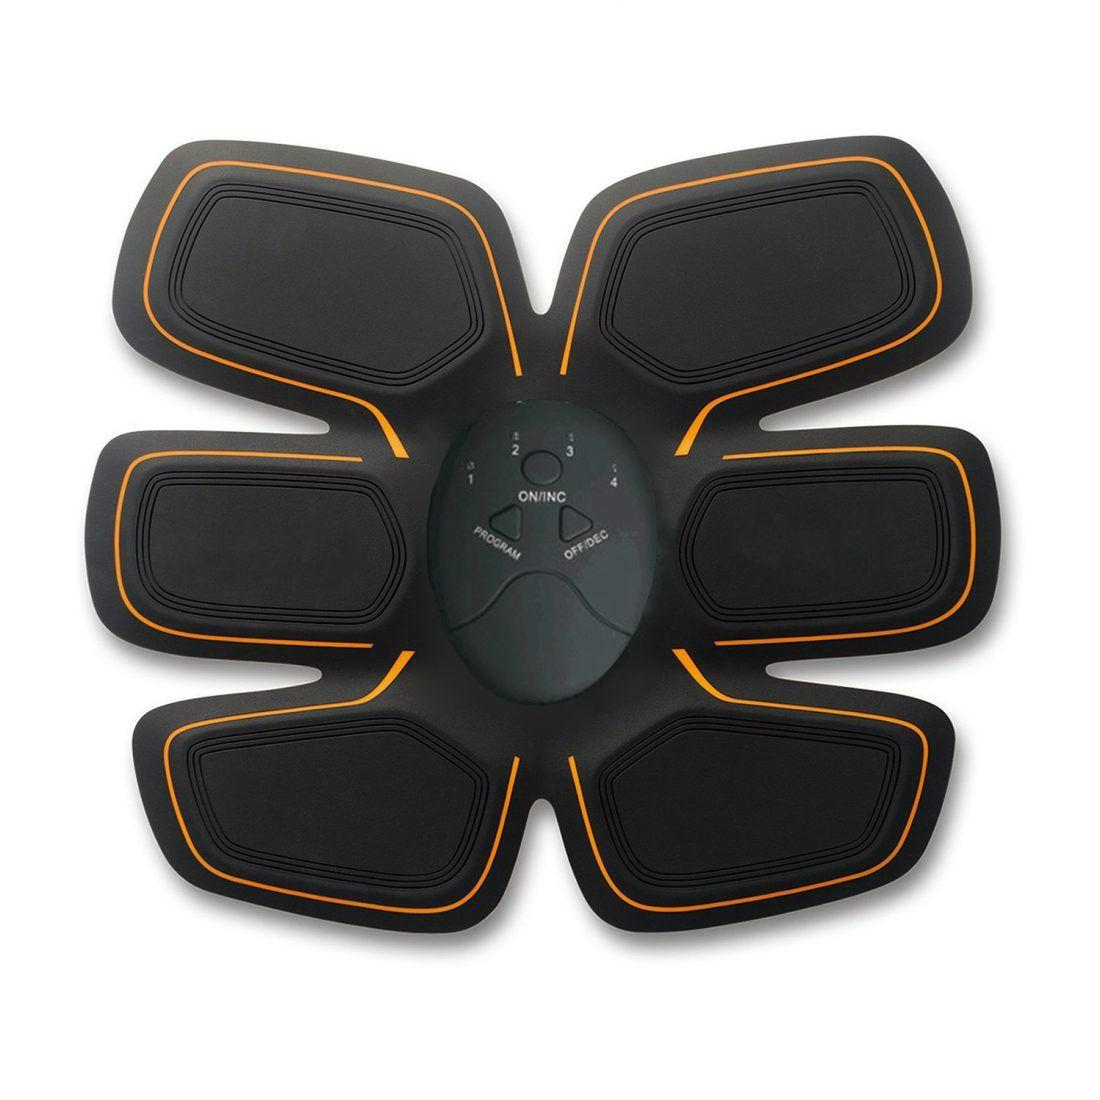 Хит продаж Пояс миостимулятор EMS-Trainer df74a6badbbcd7d4fe4a99fdc0dc6d12.jpg